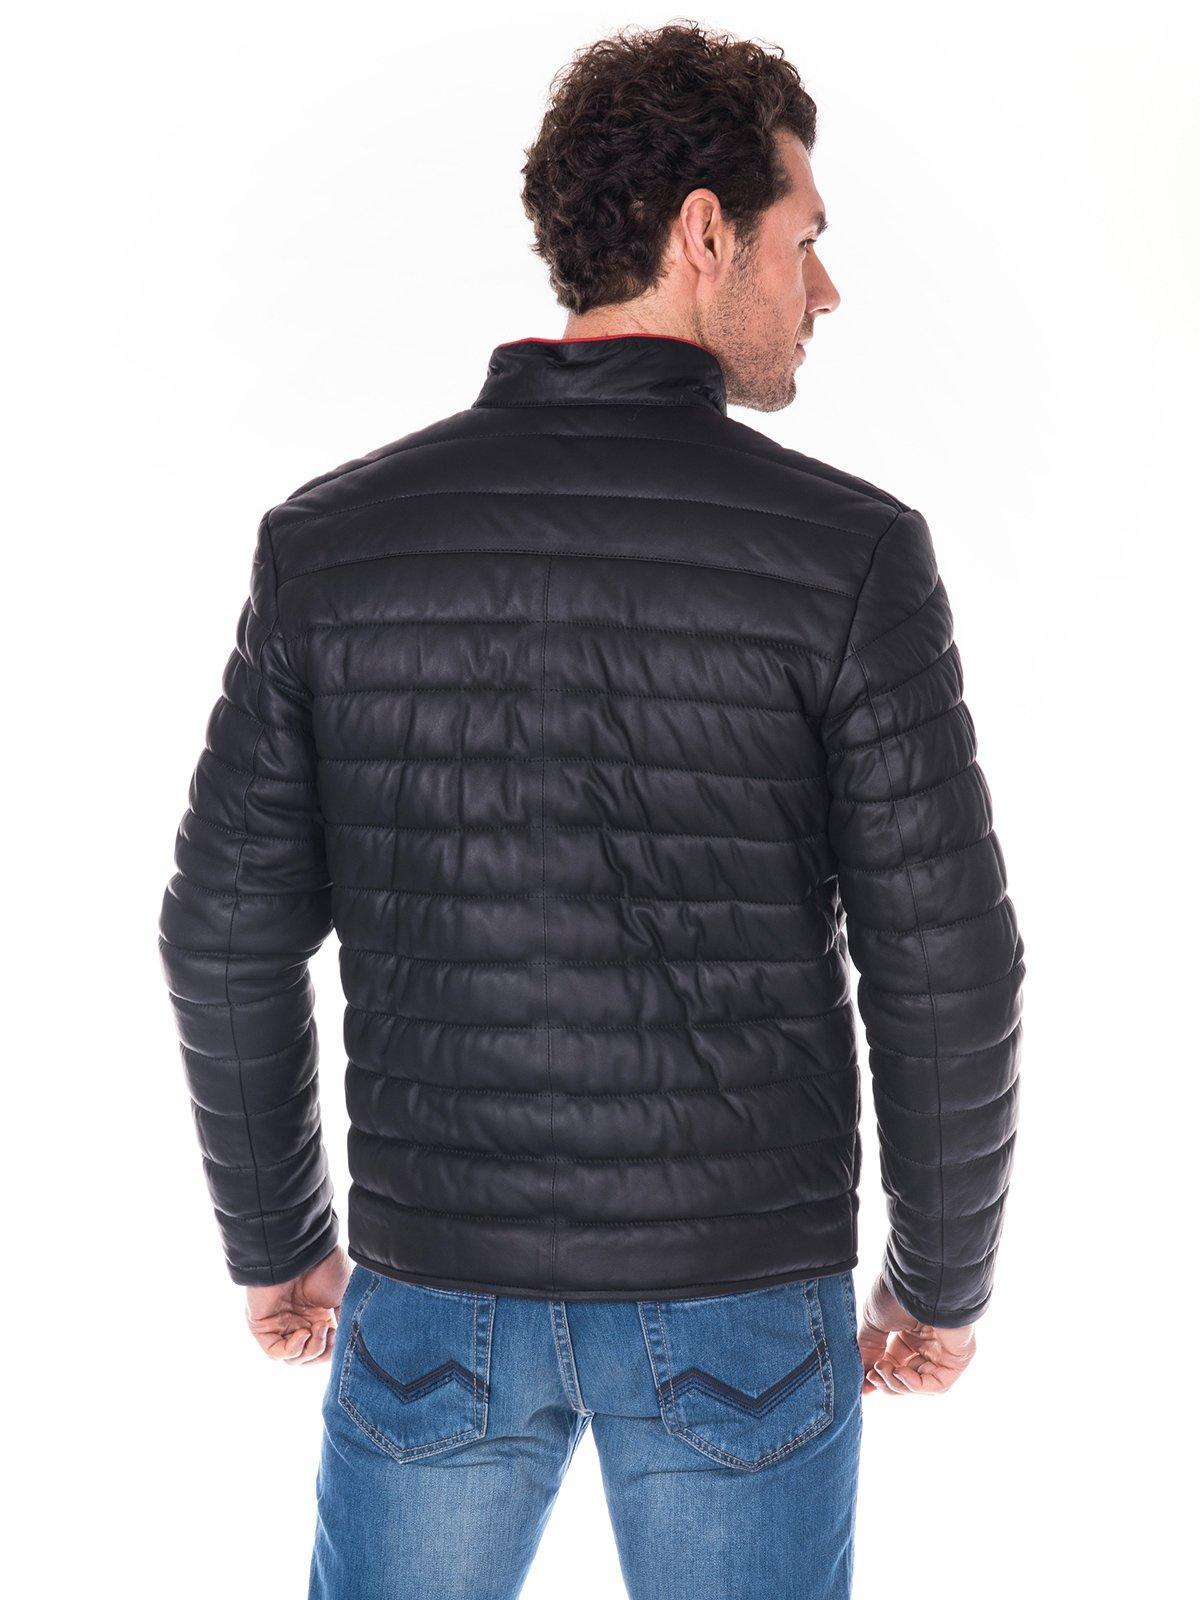 Куртка чорна | 2033791 | фото 5